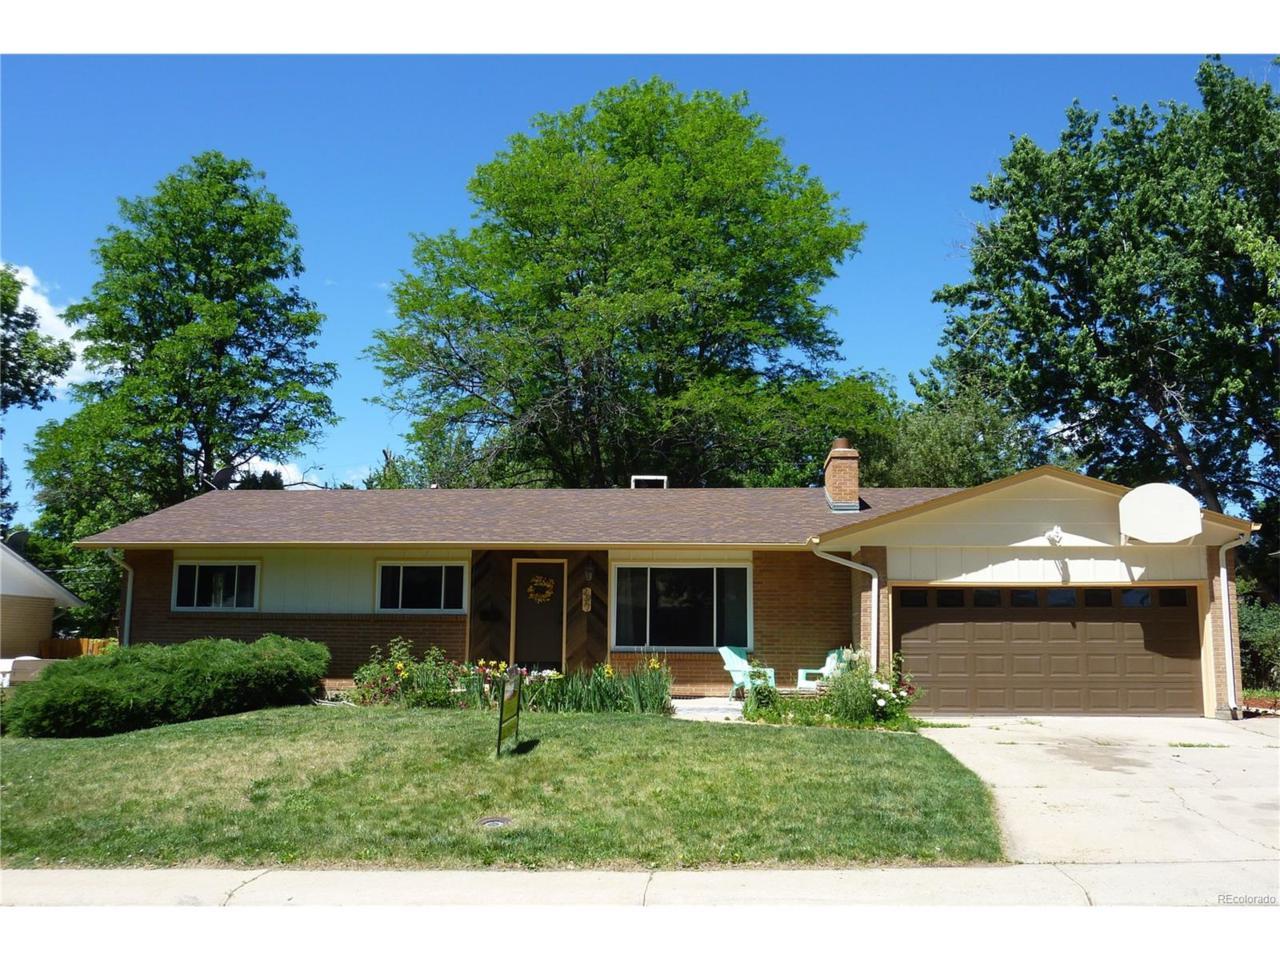 2977 S Wolff Street, Denver, CO 80236 (MLS #4810392) :: 8z Real Estate